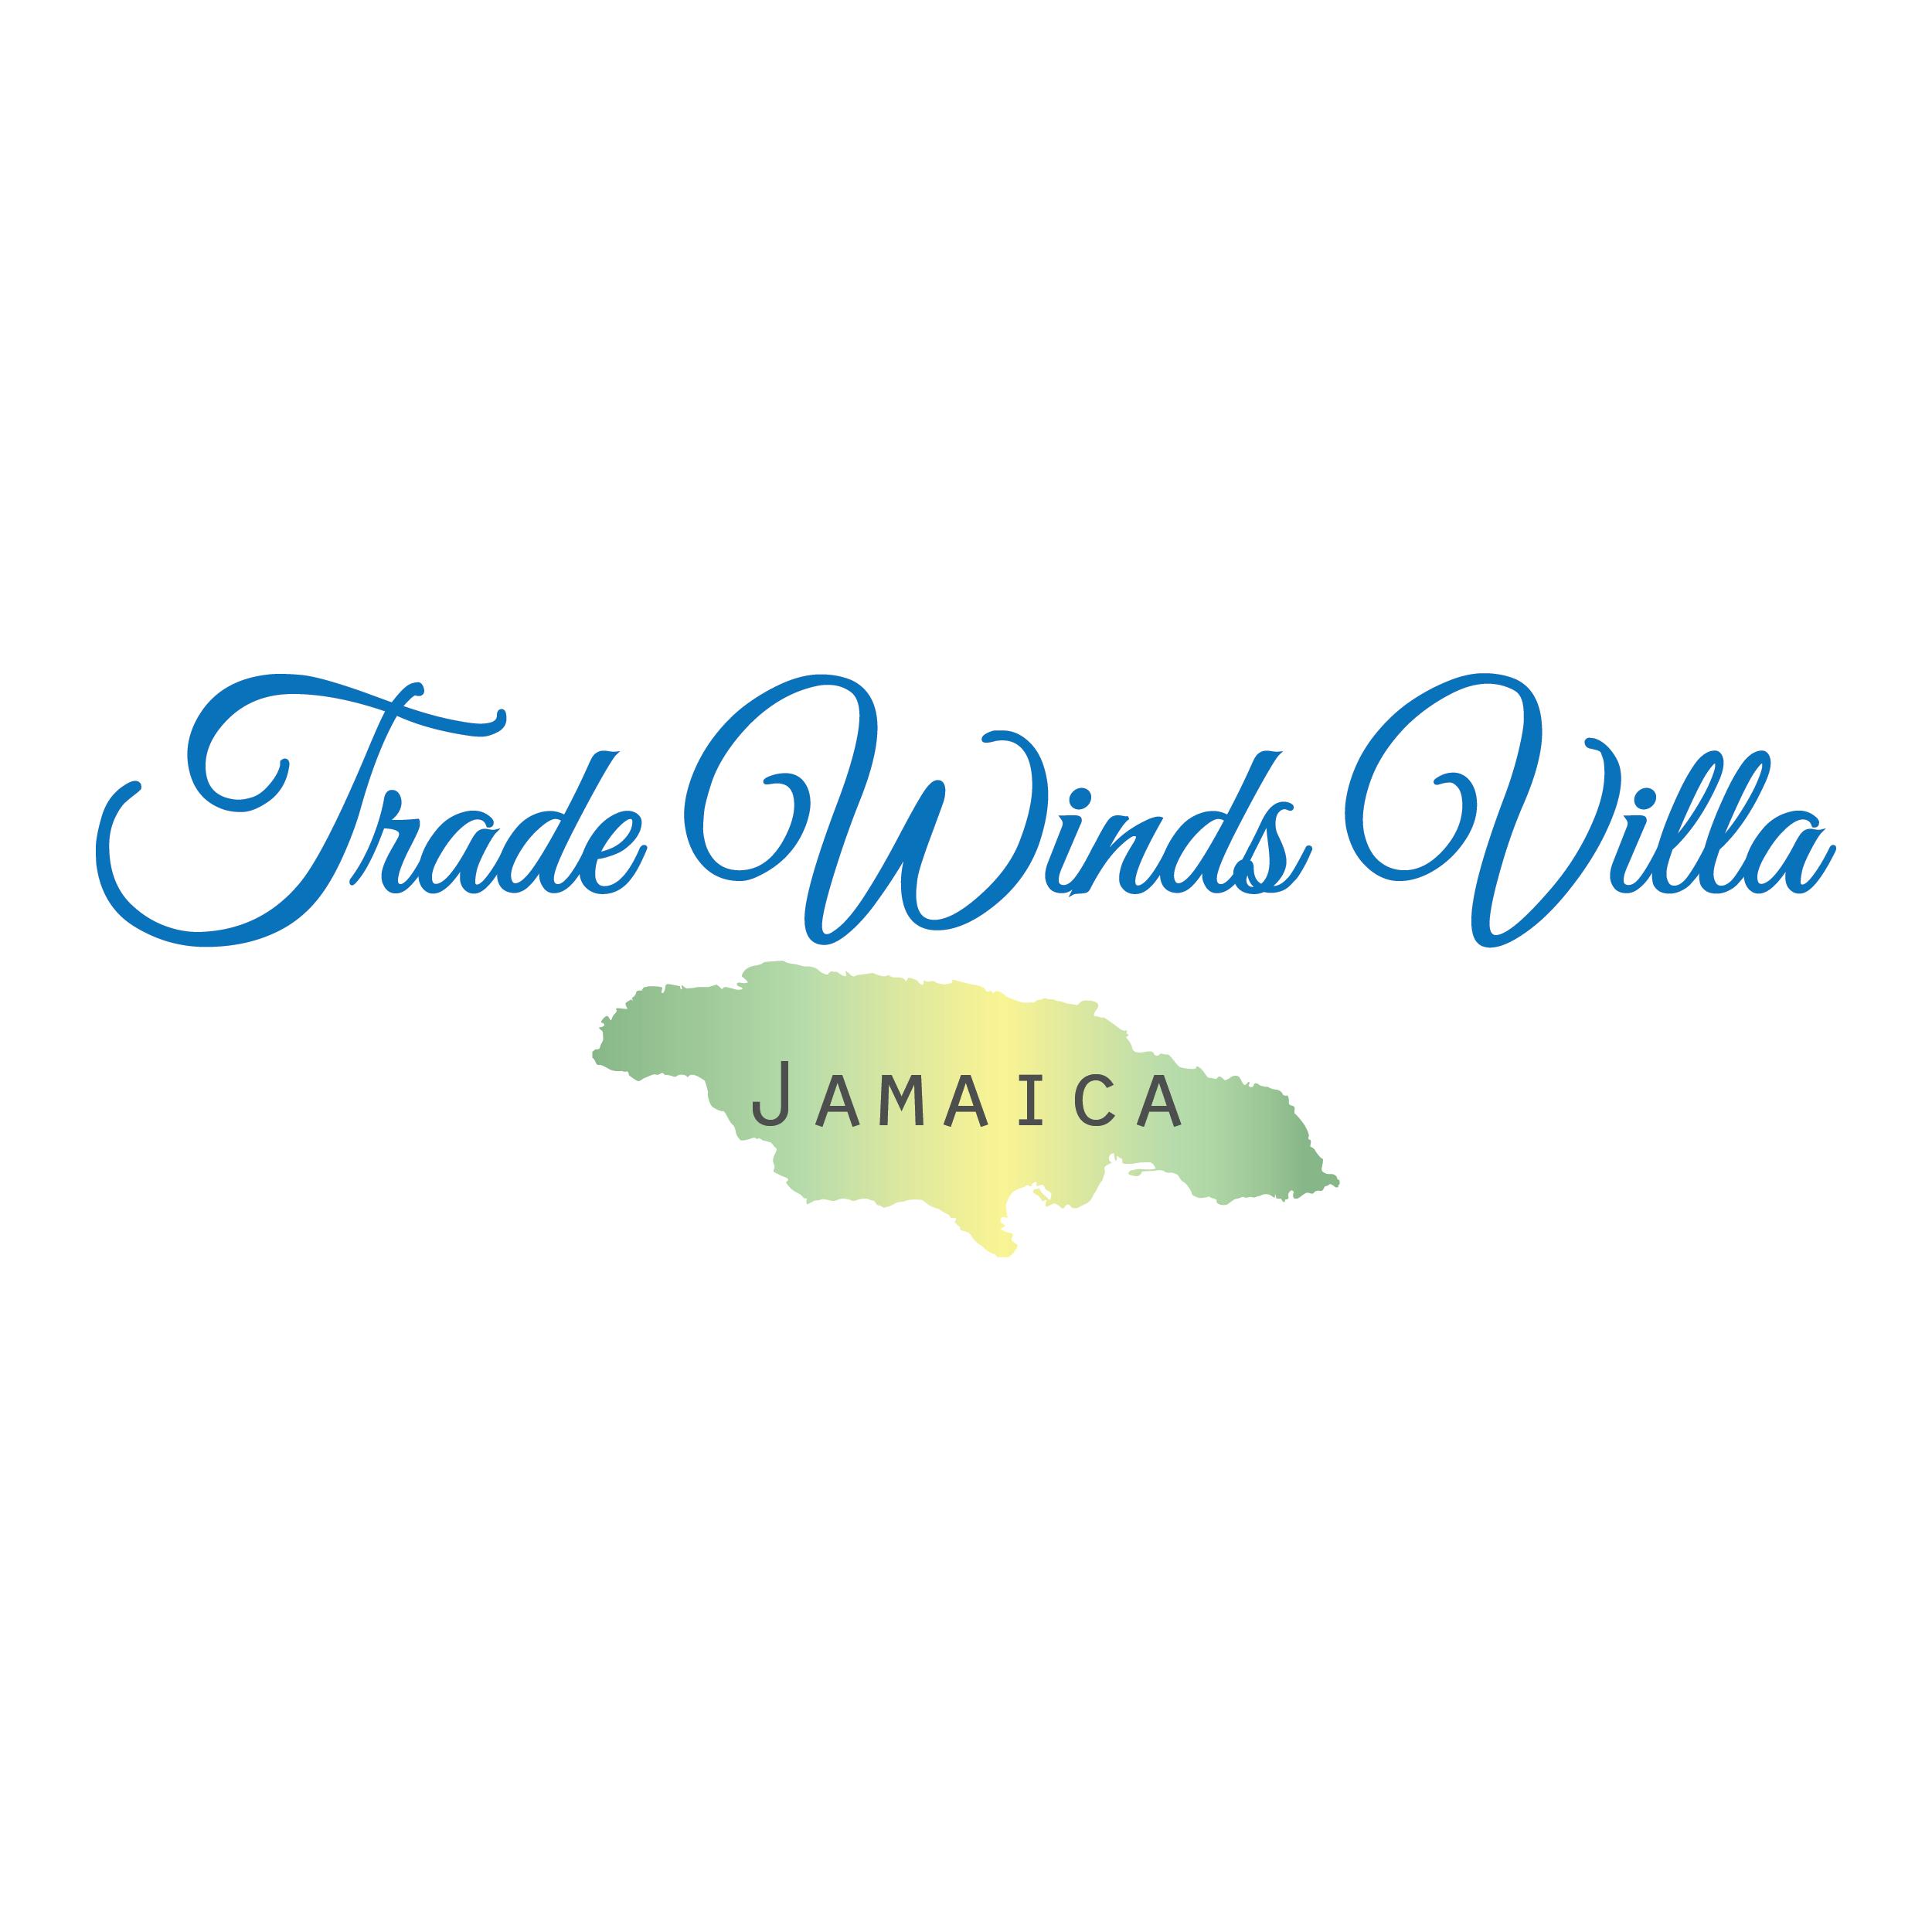 Trade Winds Villa